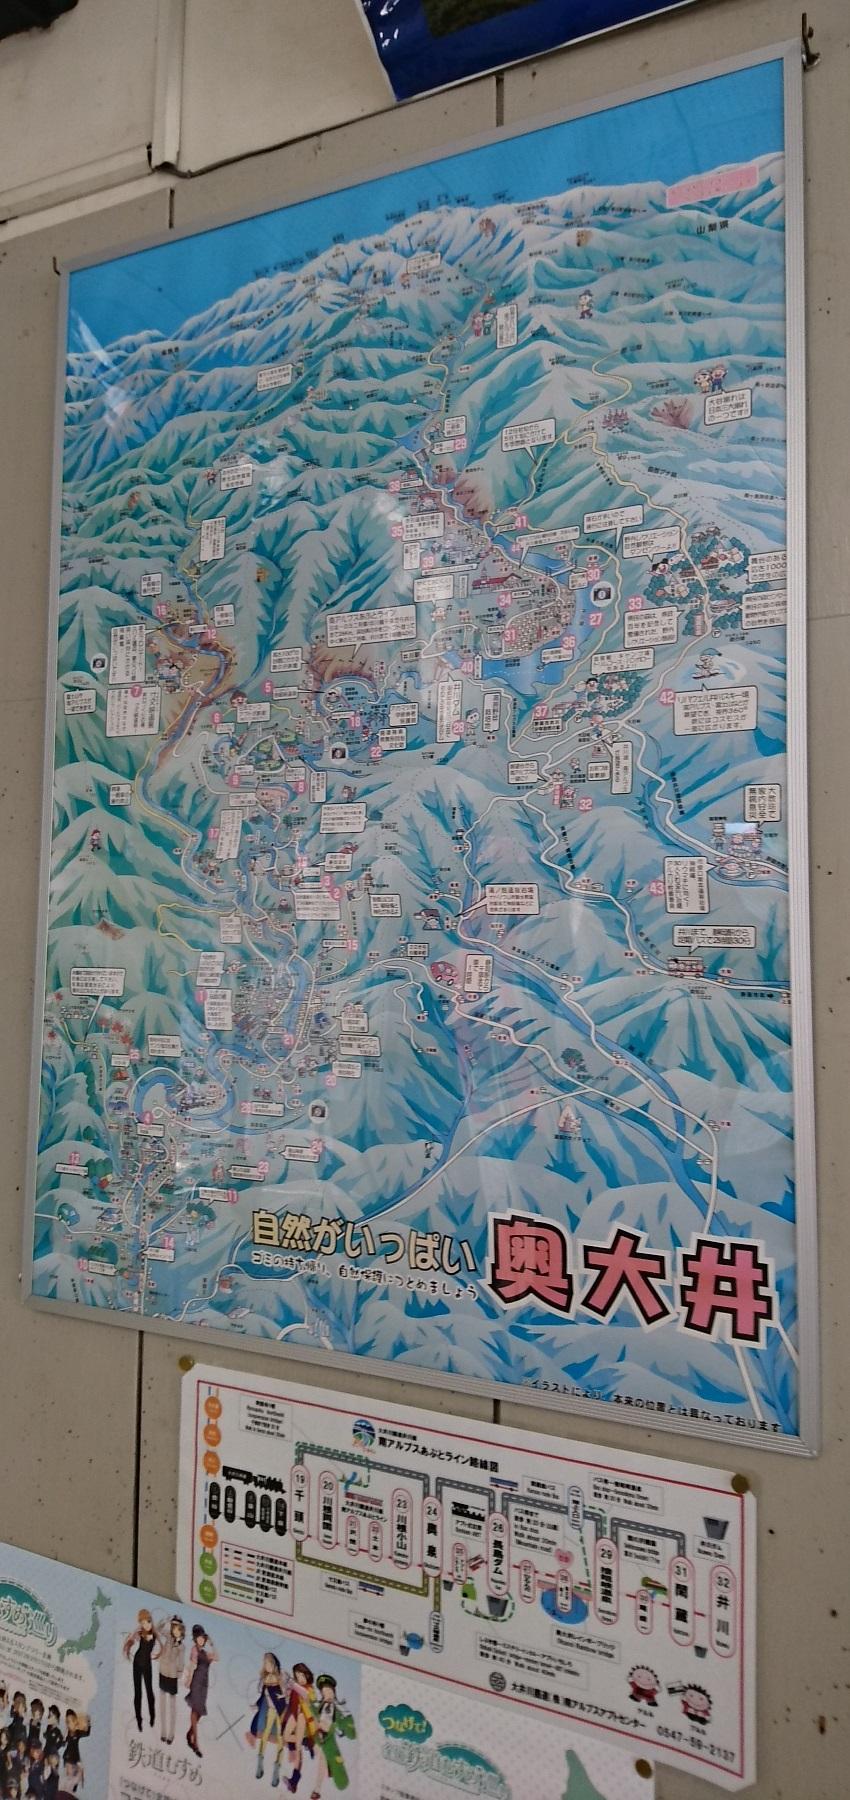 2018.3.28 井川線 (124) 井川 - 奥大井の地図 850-1800